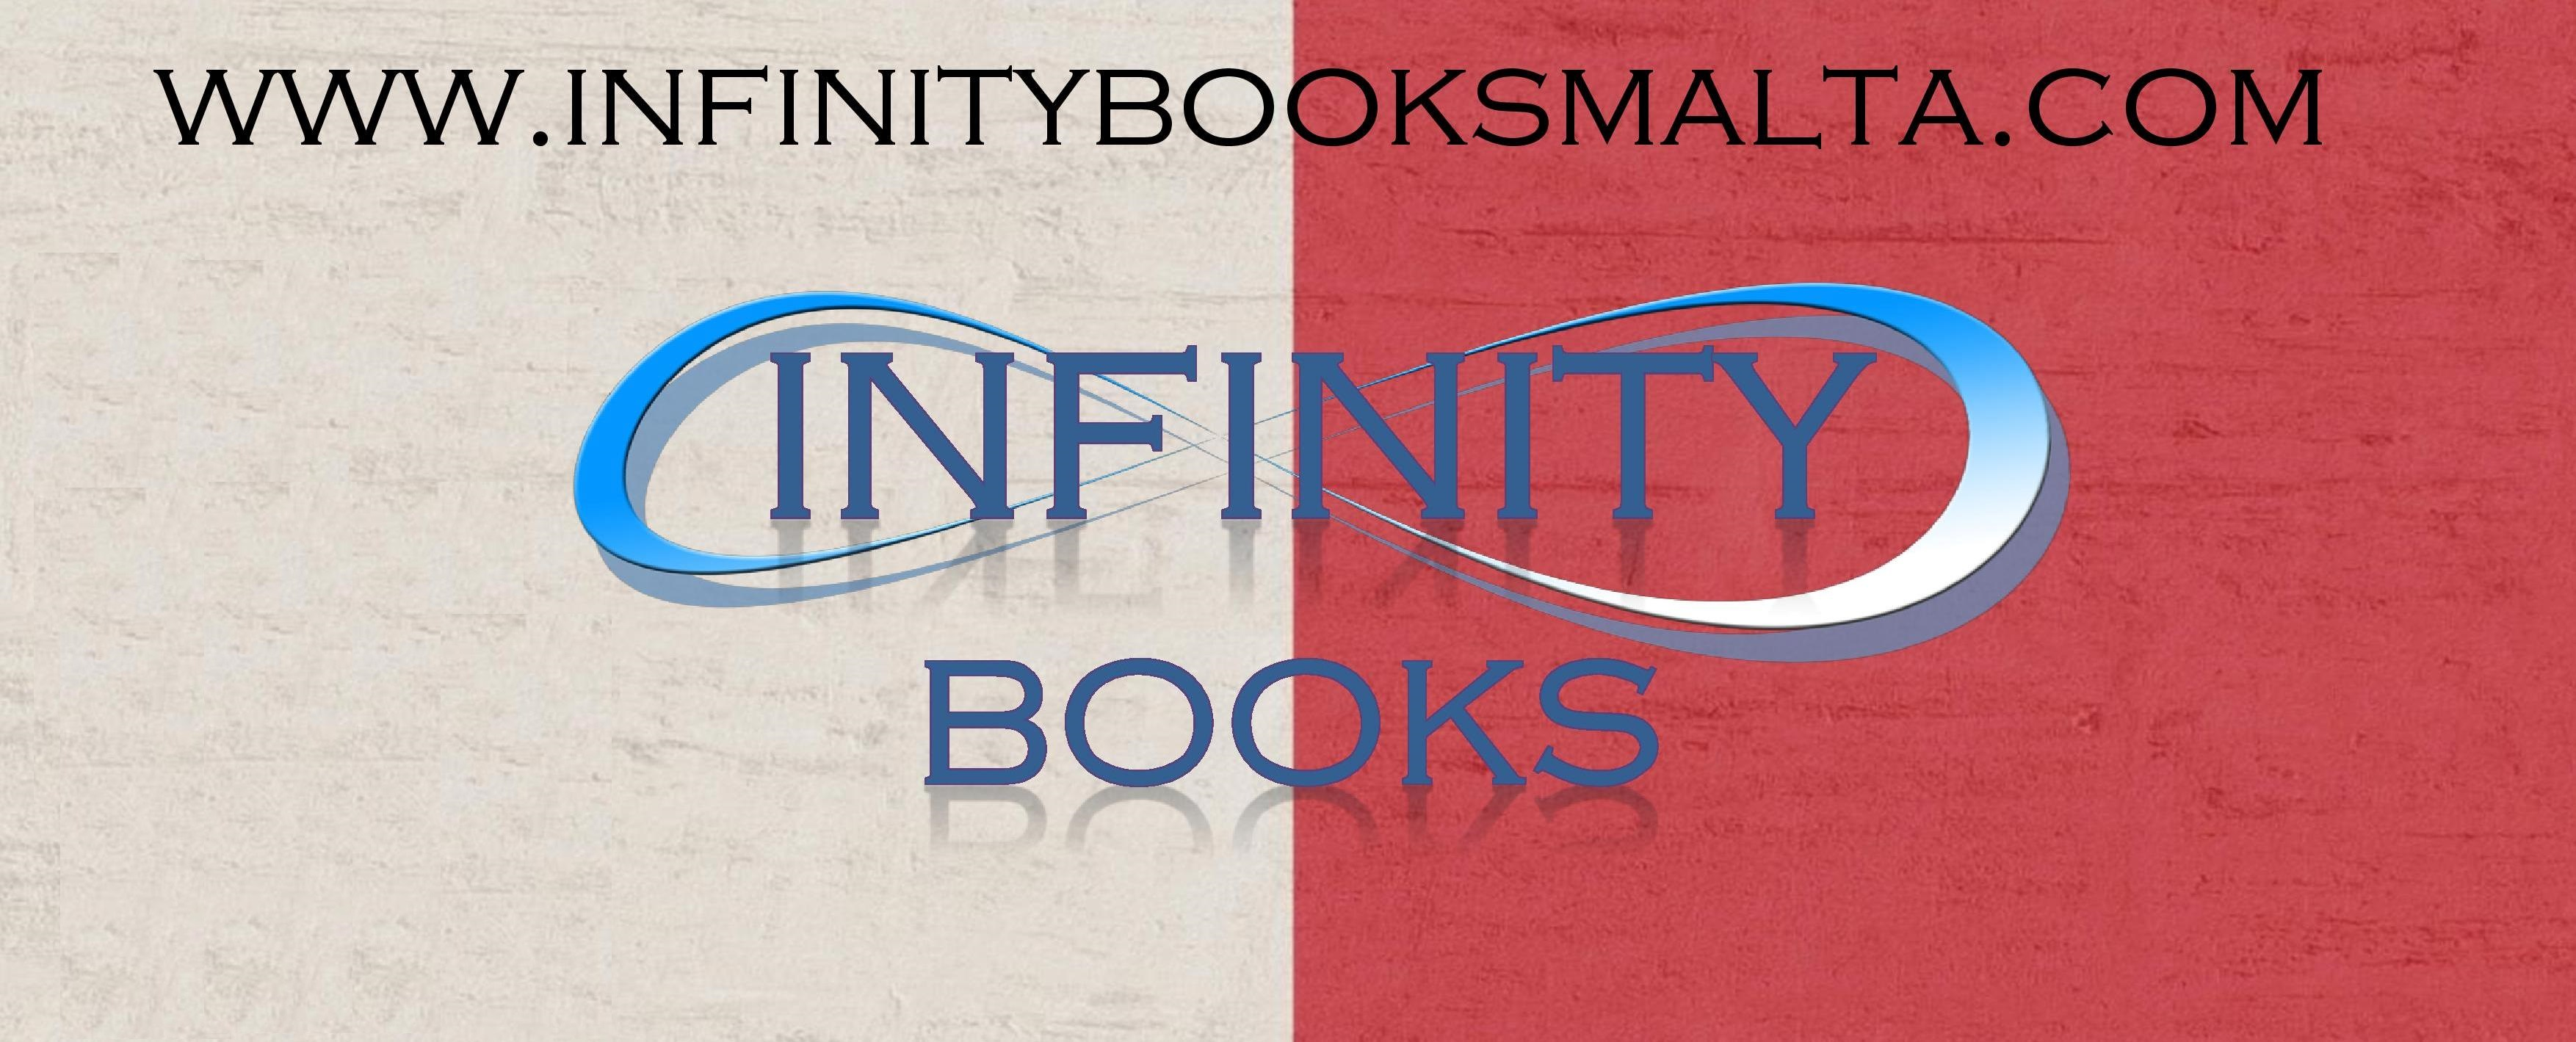 www.infinitybooksmalta.com